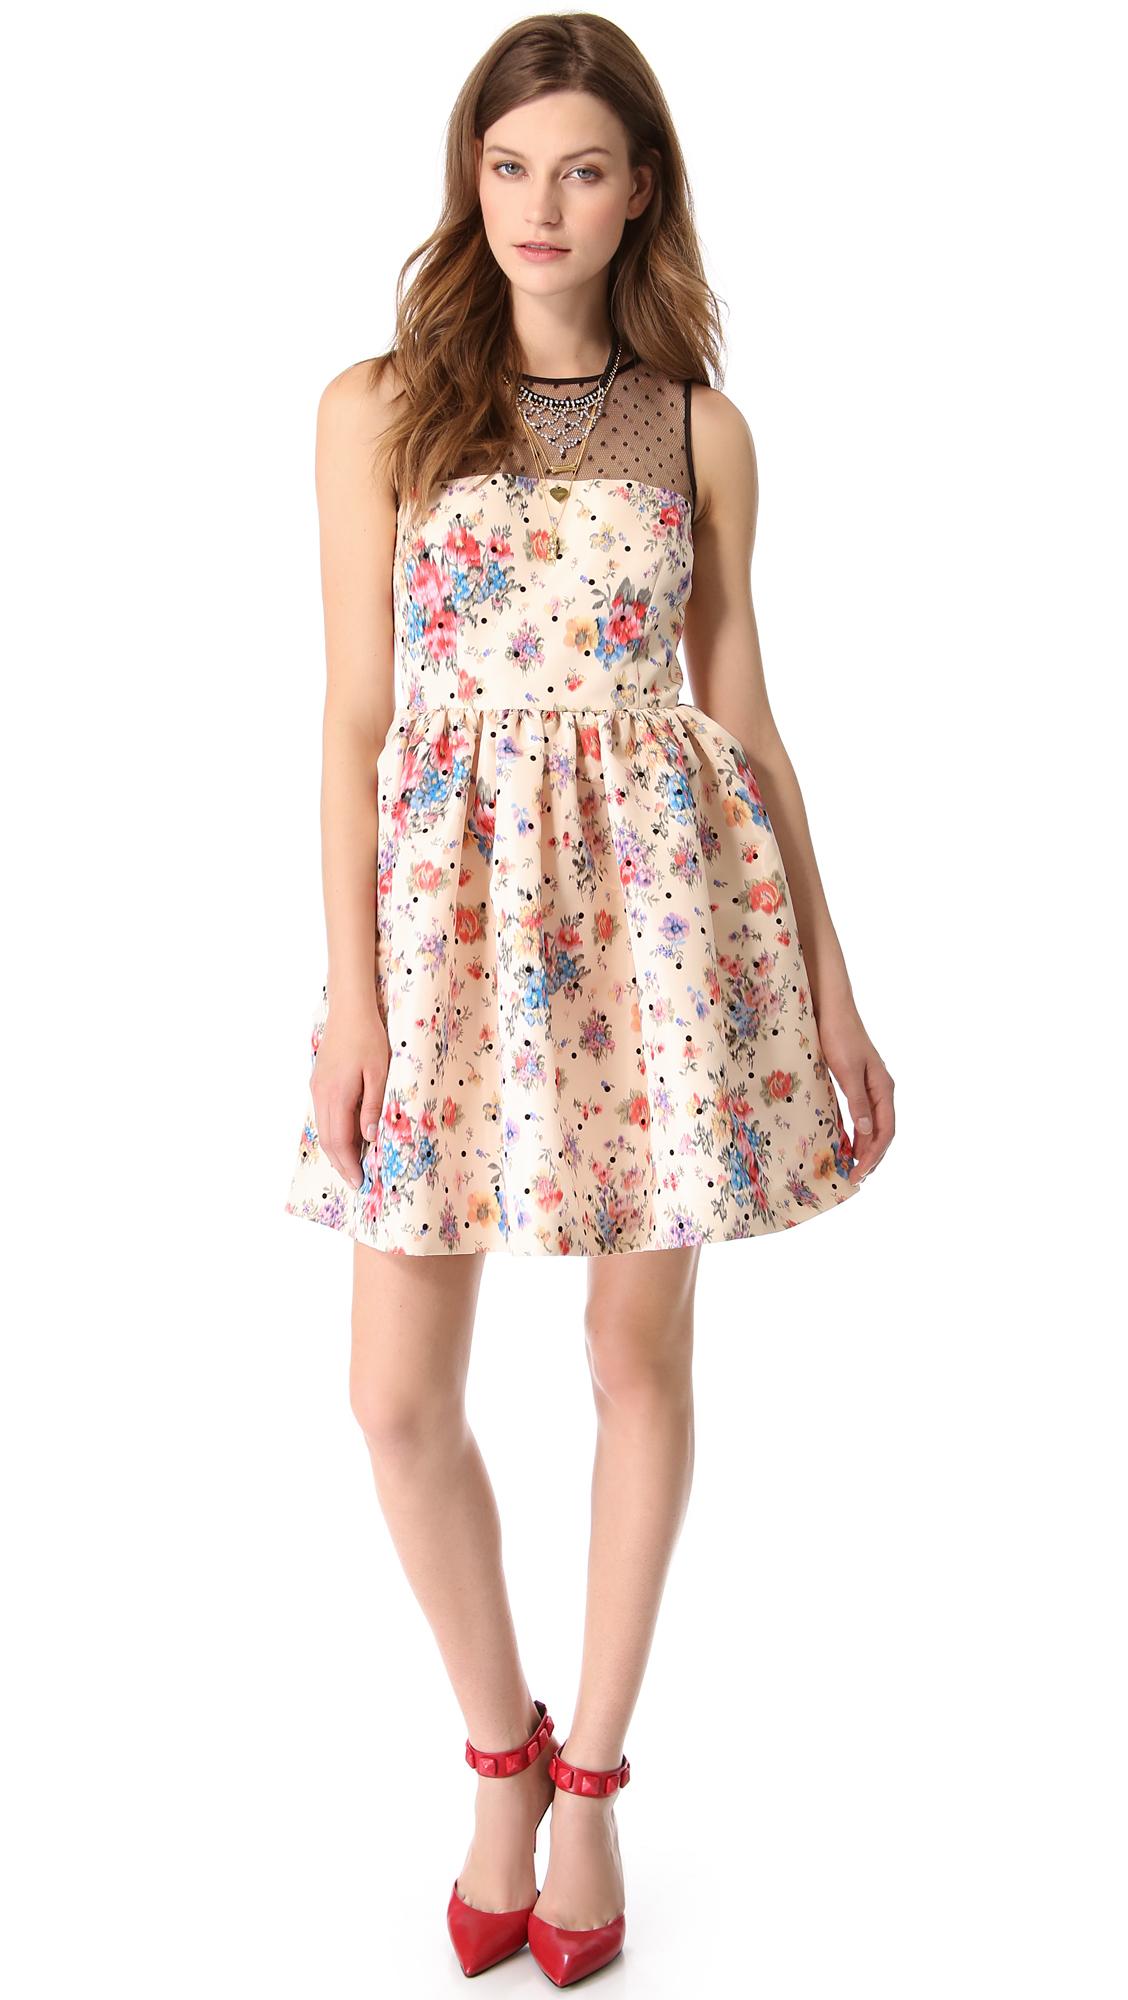 842793be310 Lyst - RED Valentino Polka Dot Flower Dress